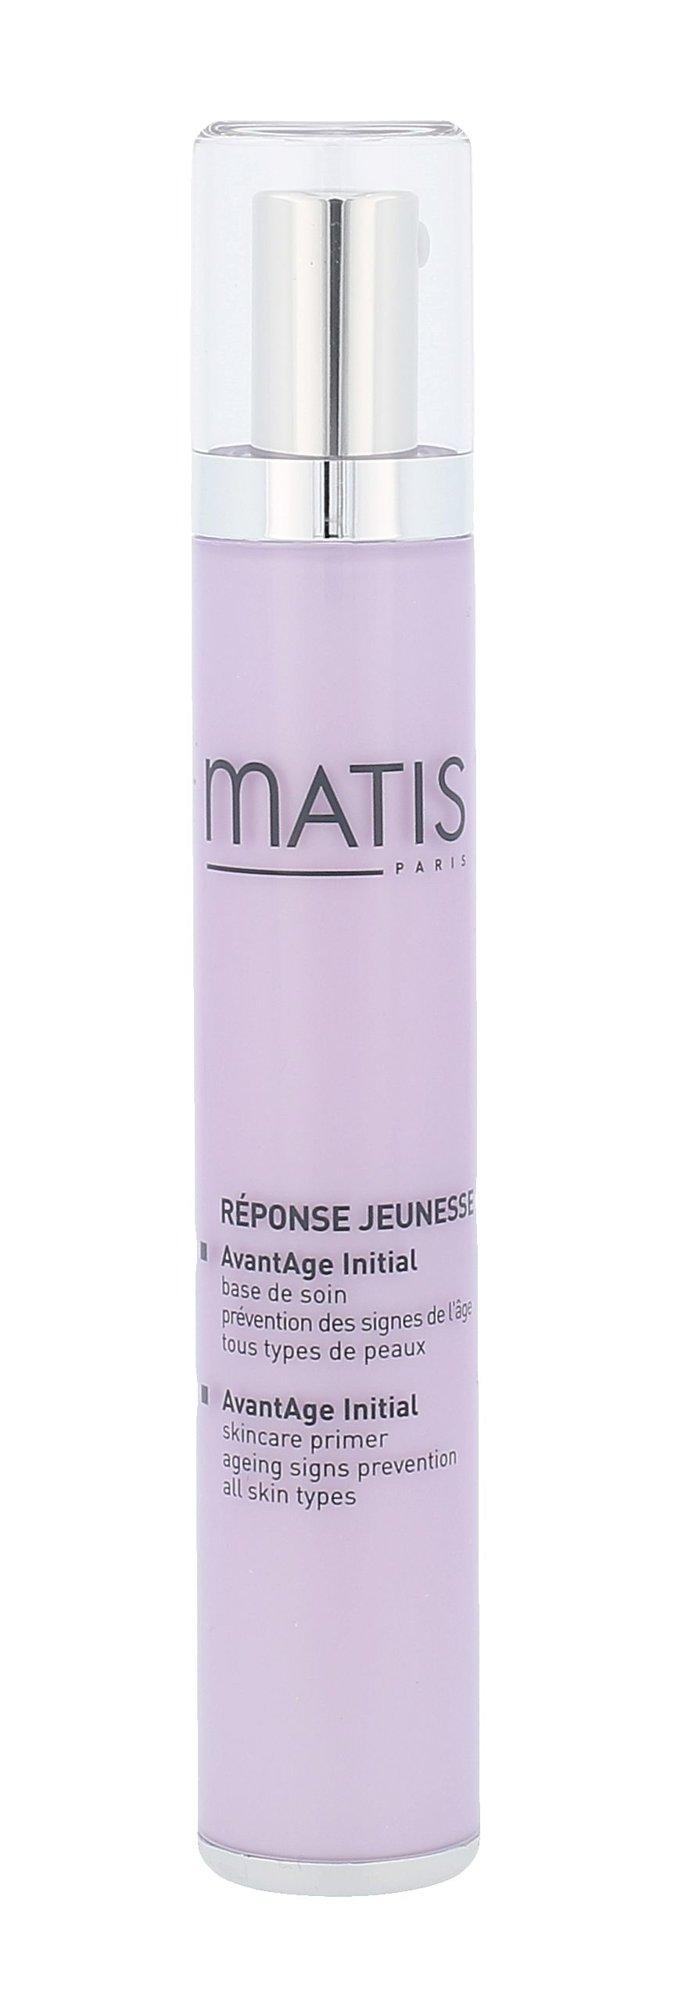 Matis Réponse Jeunesse Cosmetic 15ml  AvantAge Initial